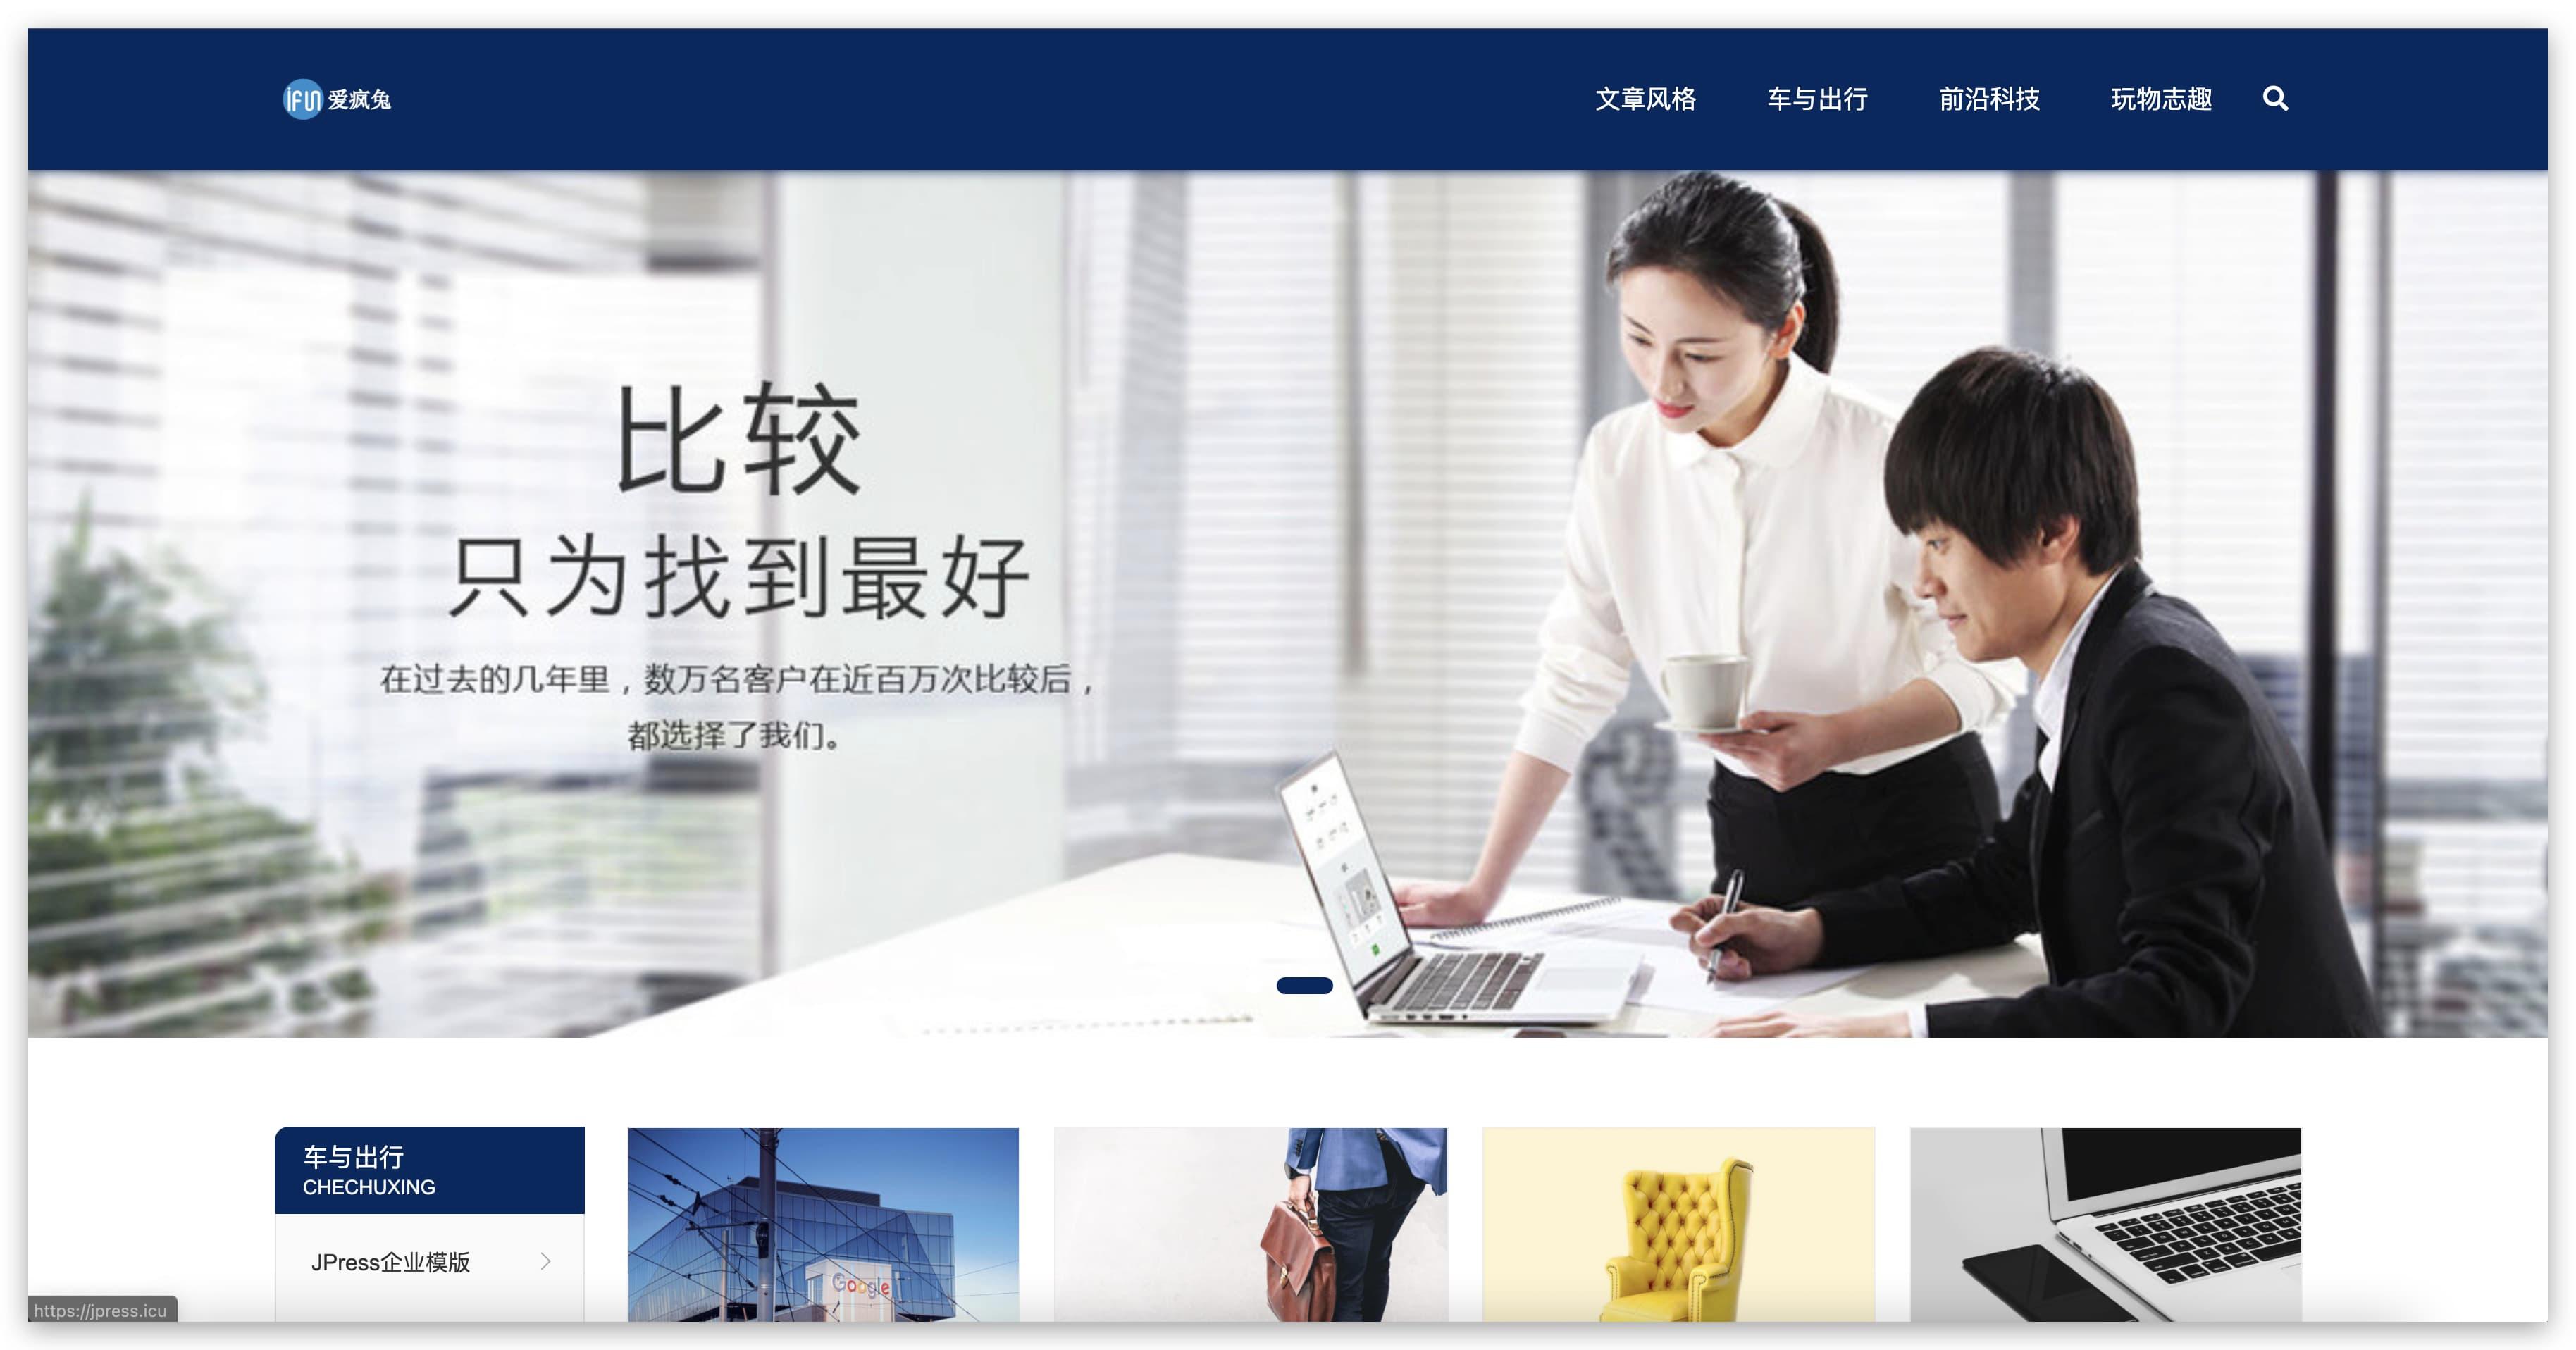 JPress企业模板-aymtwelve